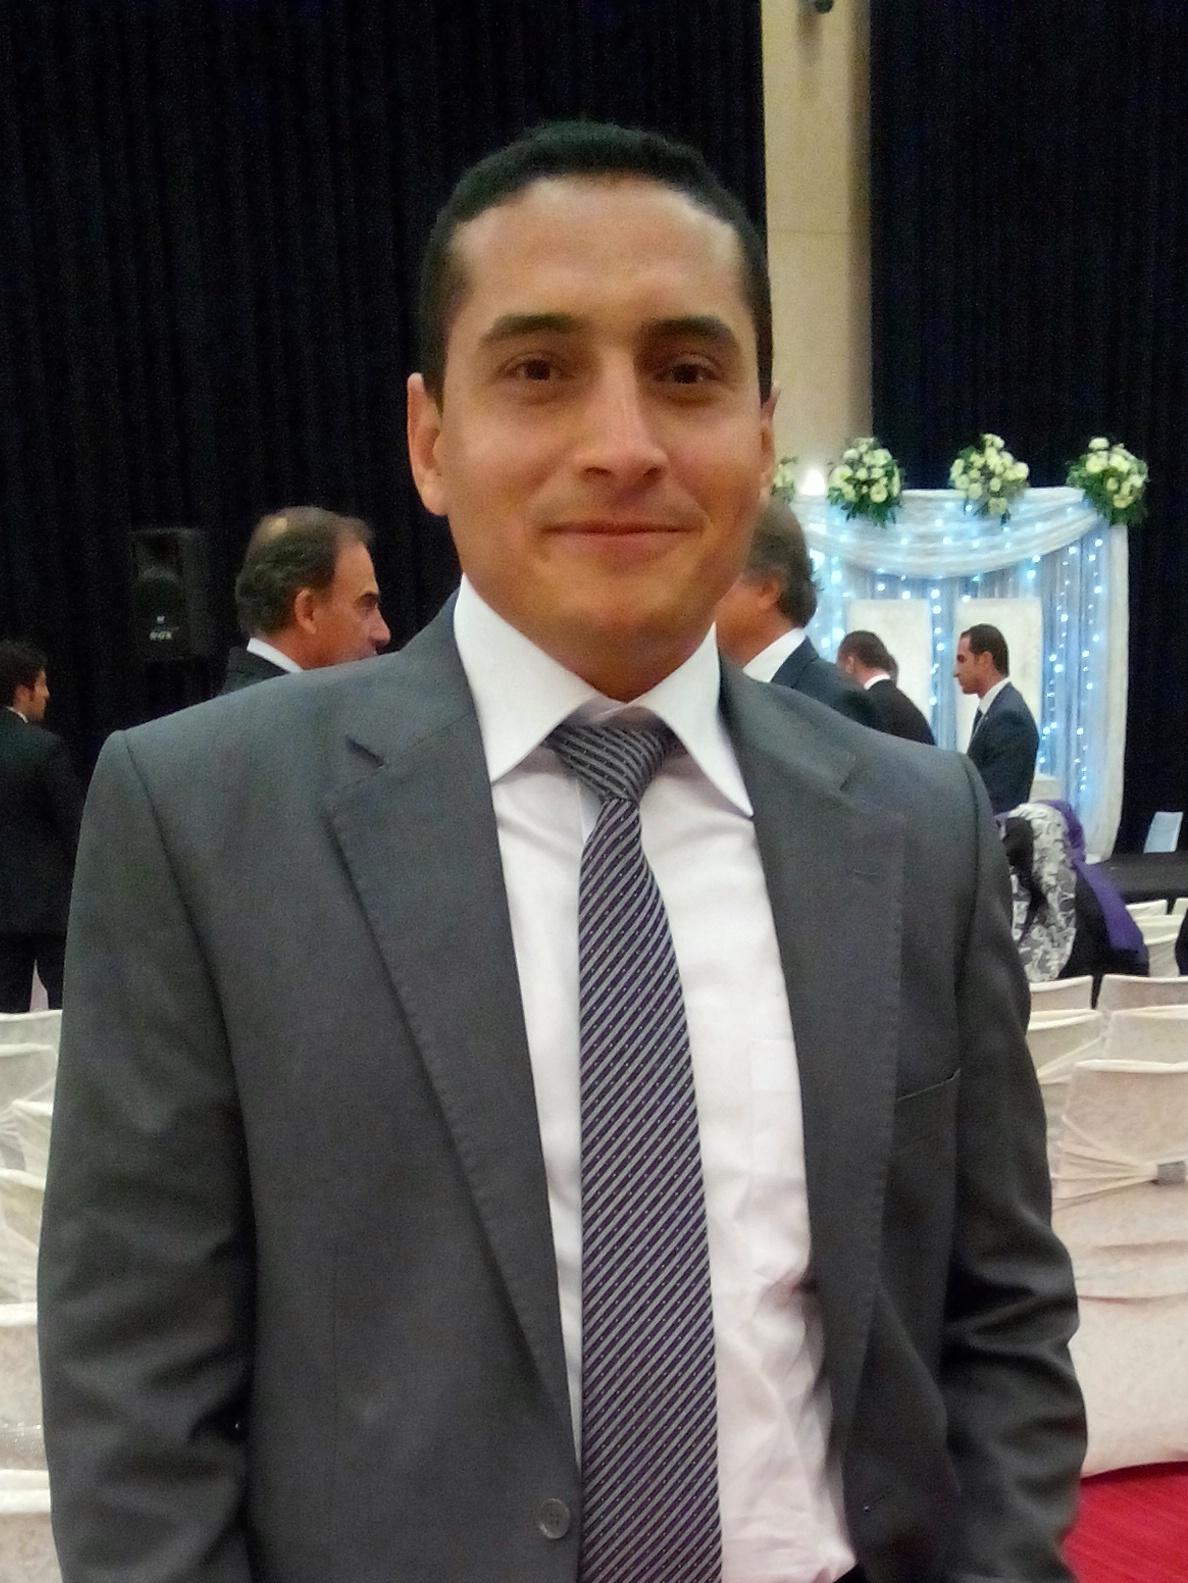 Amr Abdelnasser Ali Khalil